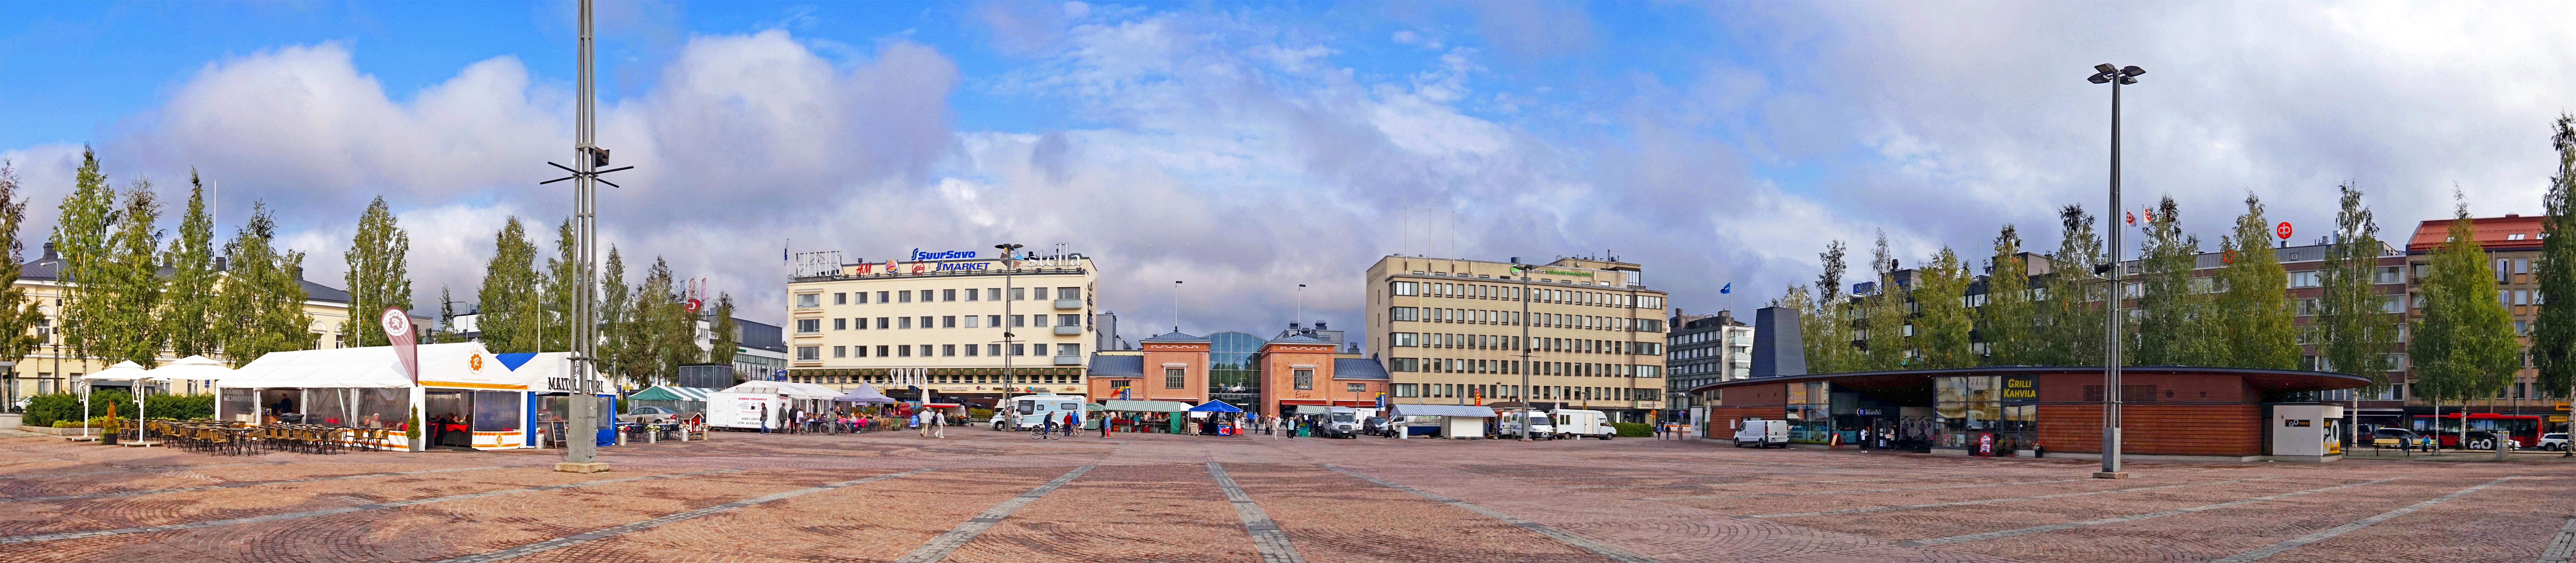 Mikkeli - market square.jpg